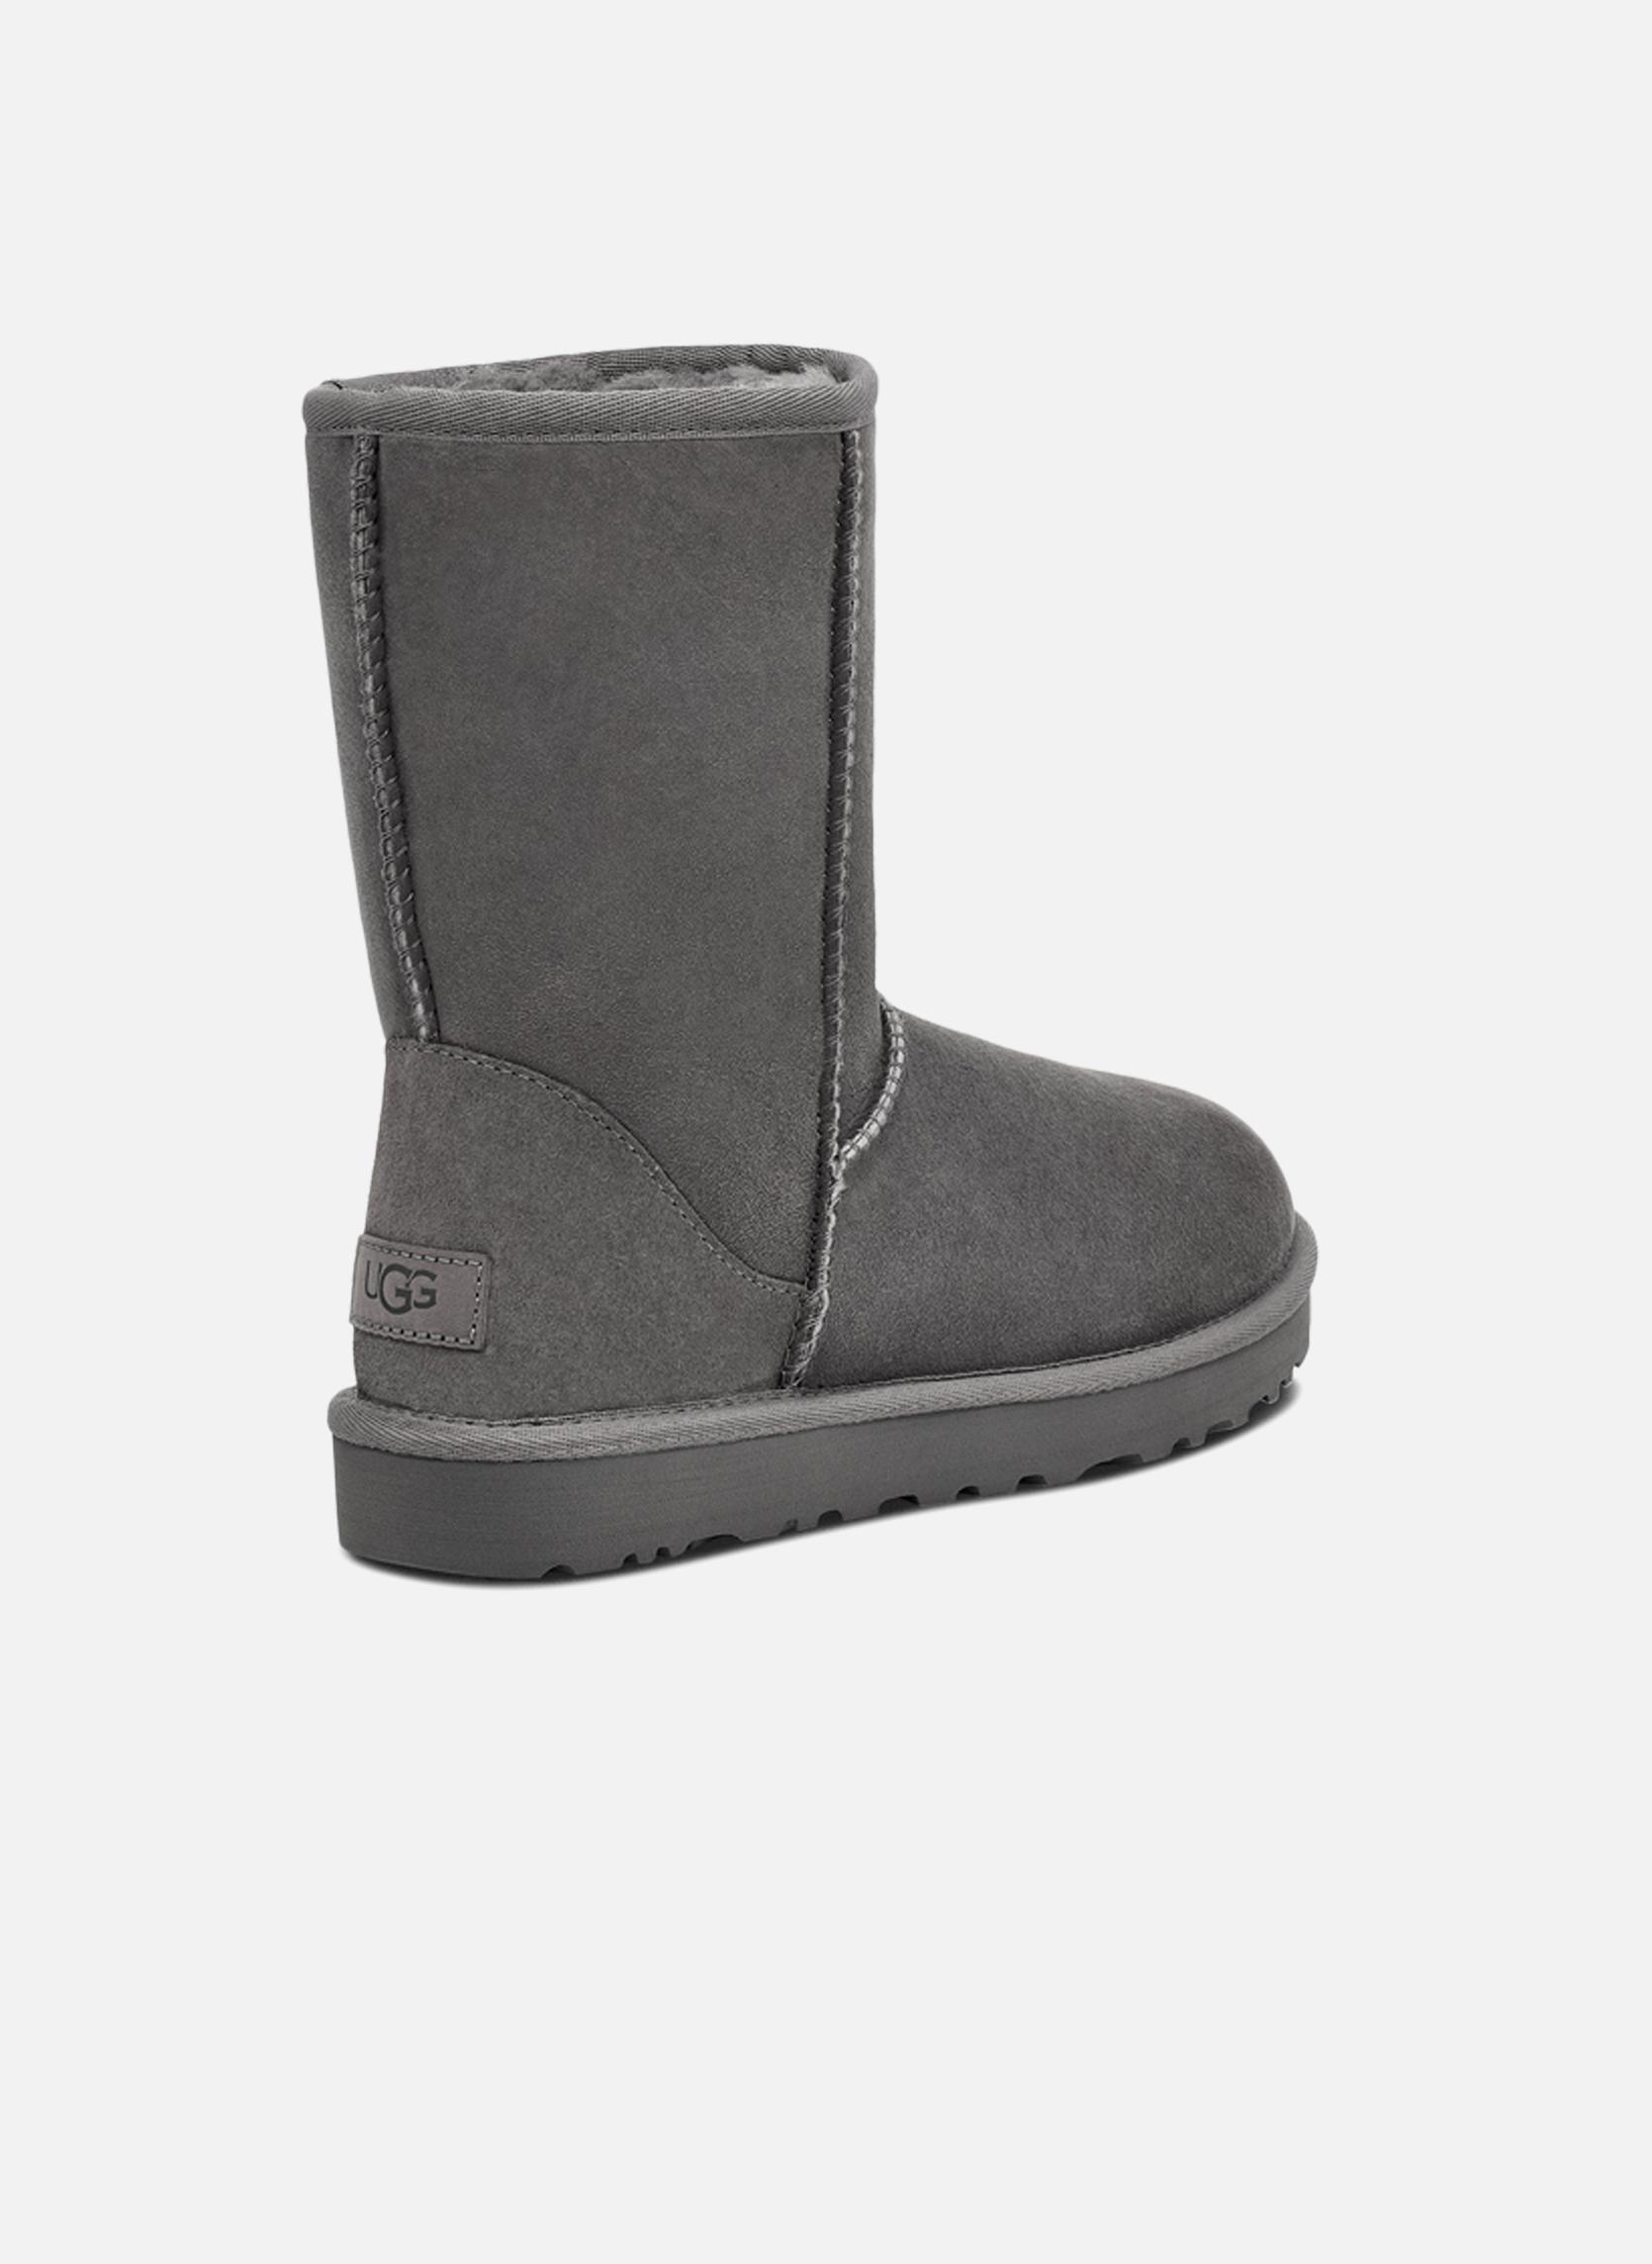 W Classic Short II Grey